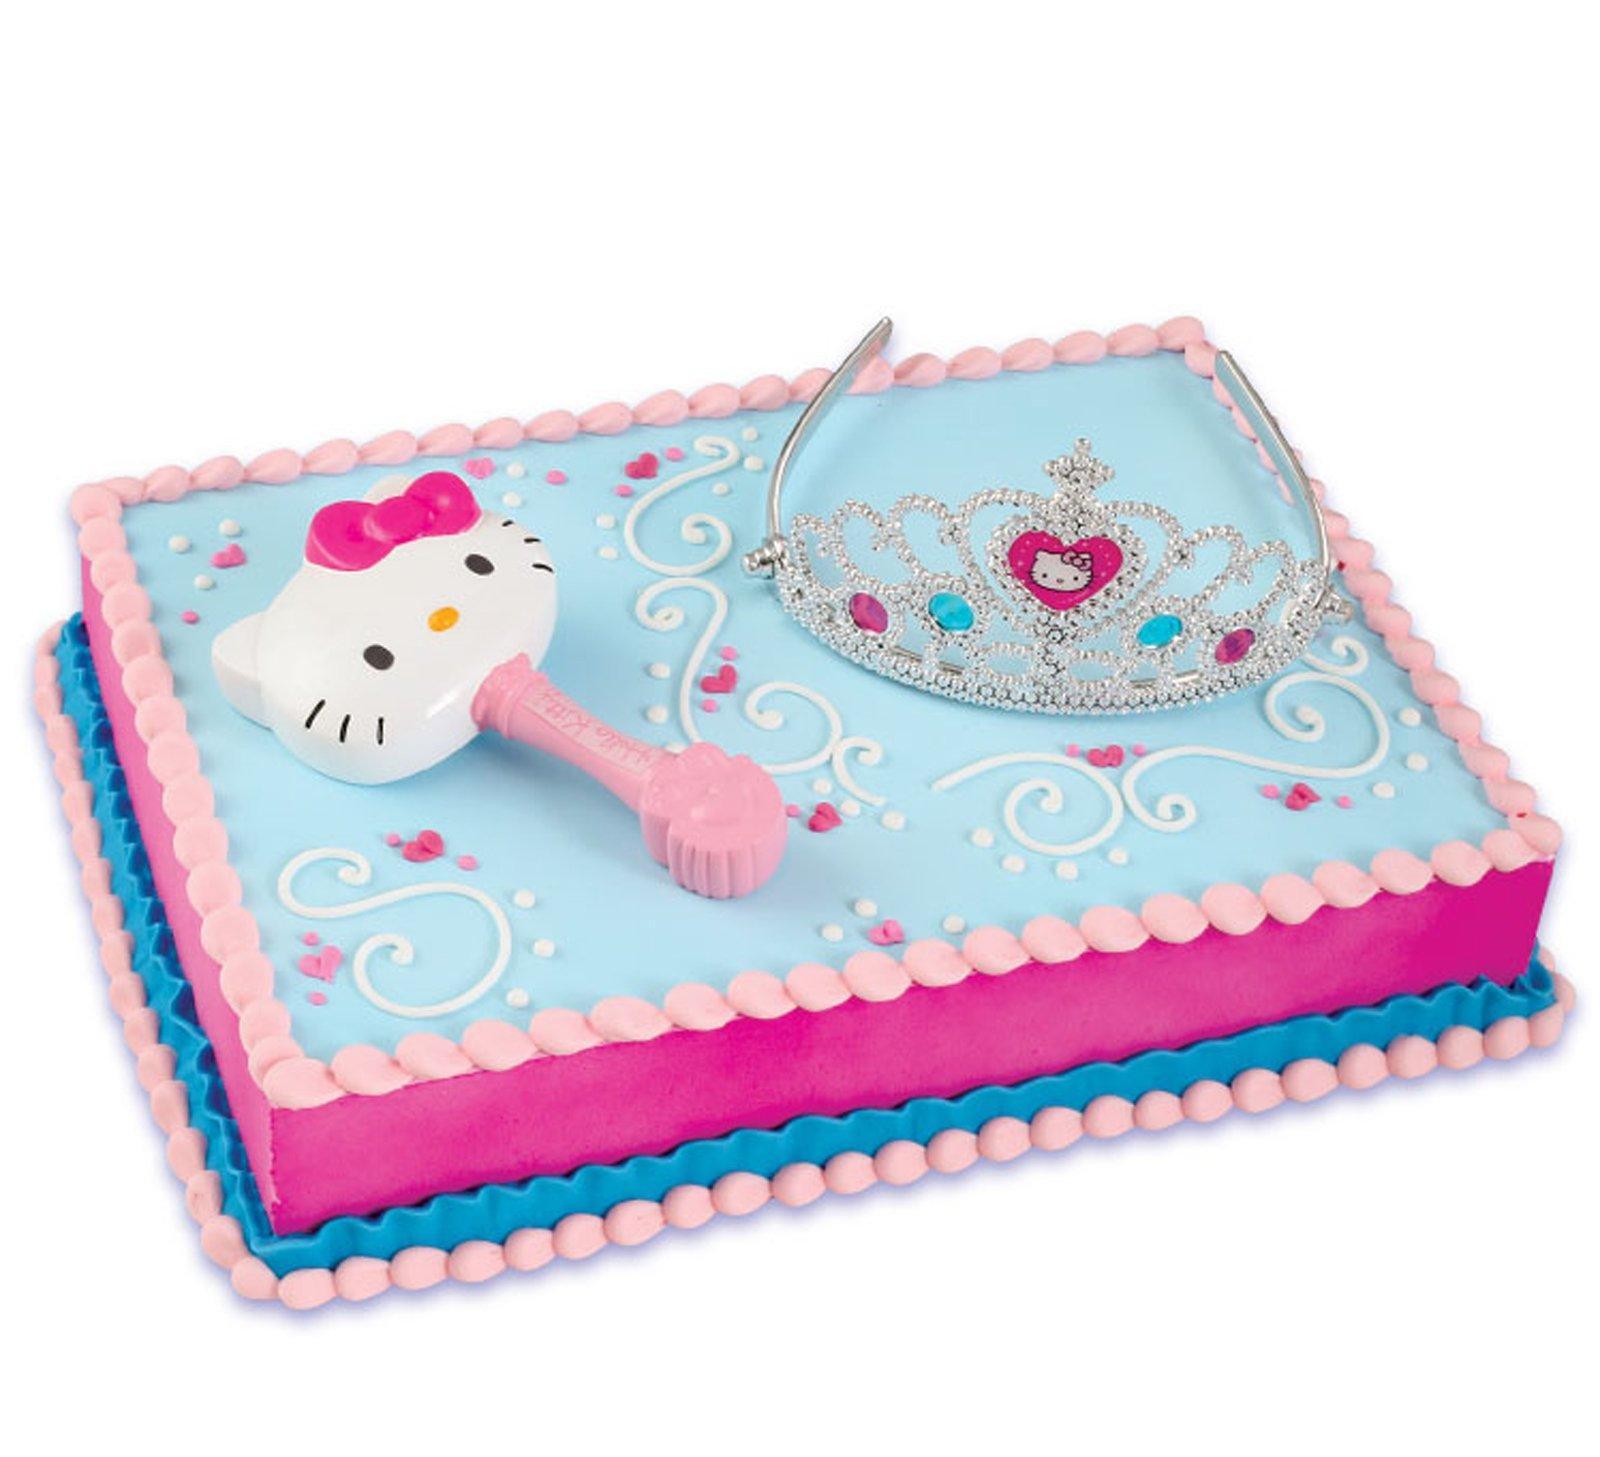 Hello Kitty Princess Cake Topper 2 Pieces BirthdayExpresscom